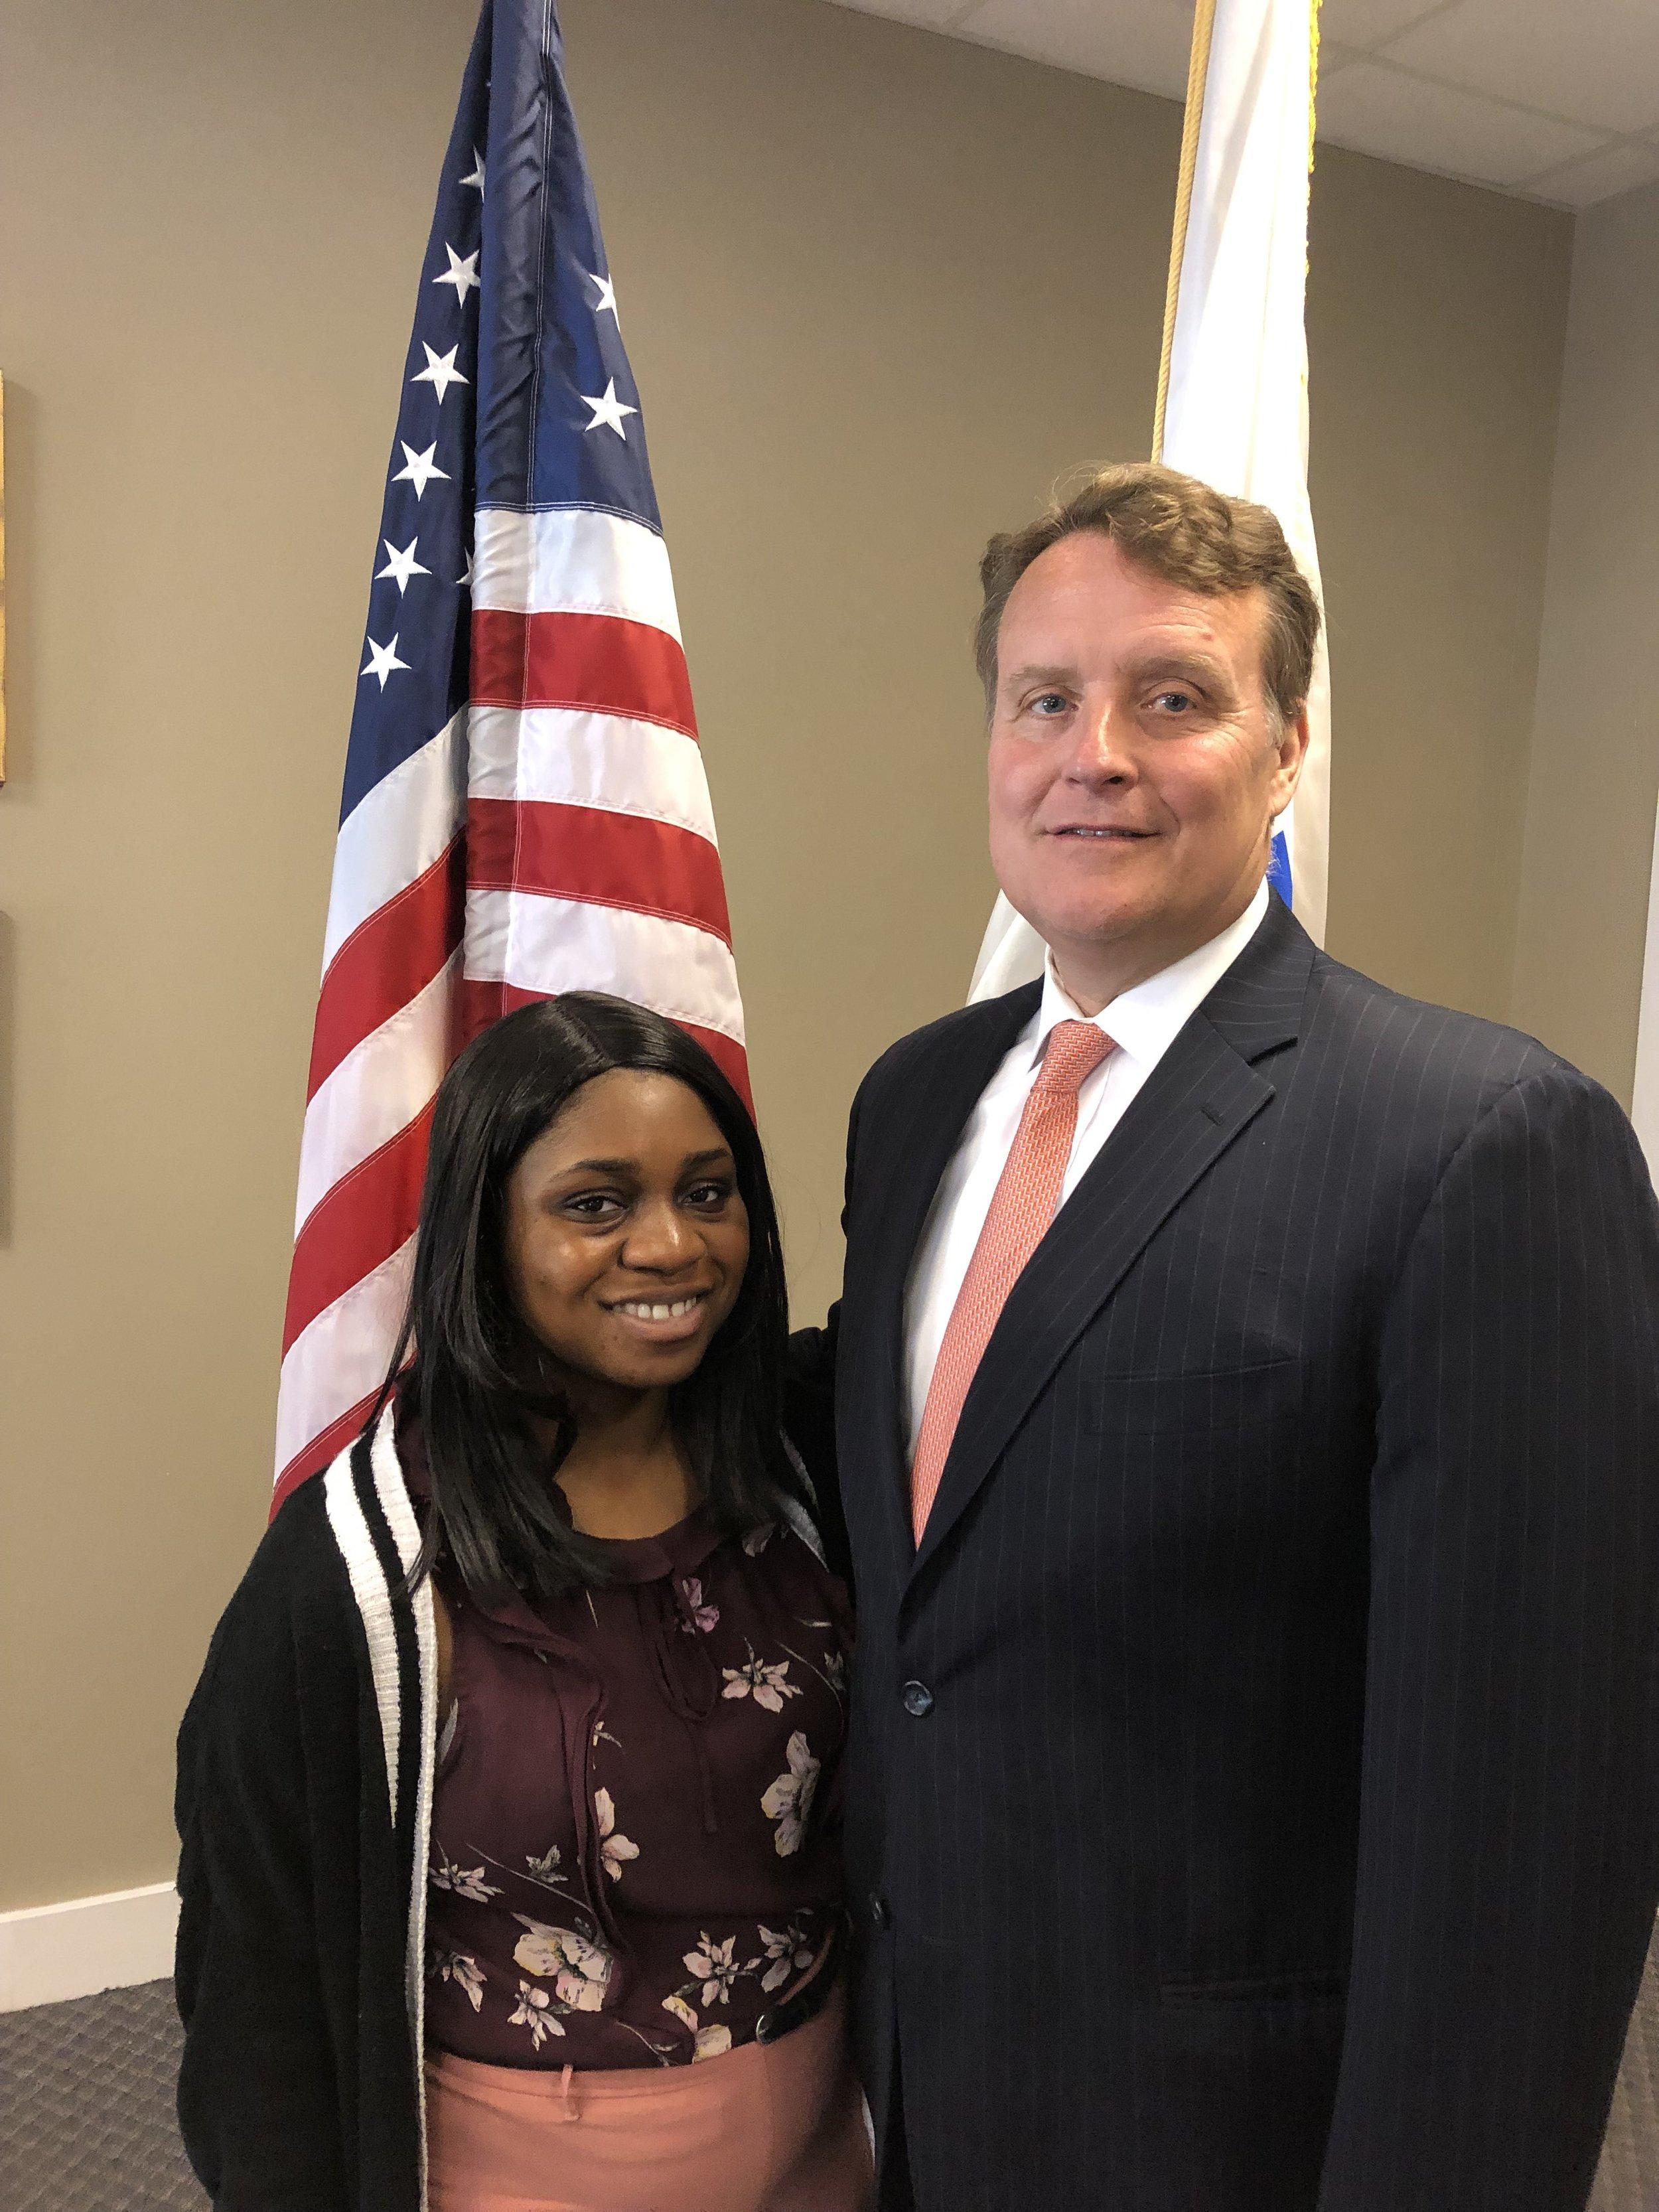 Senator Michael O. Moore with intern Alvira Bonsu, a Worcester native.